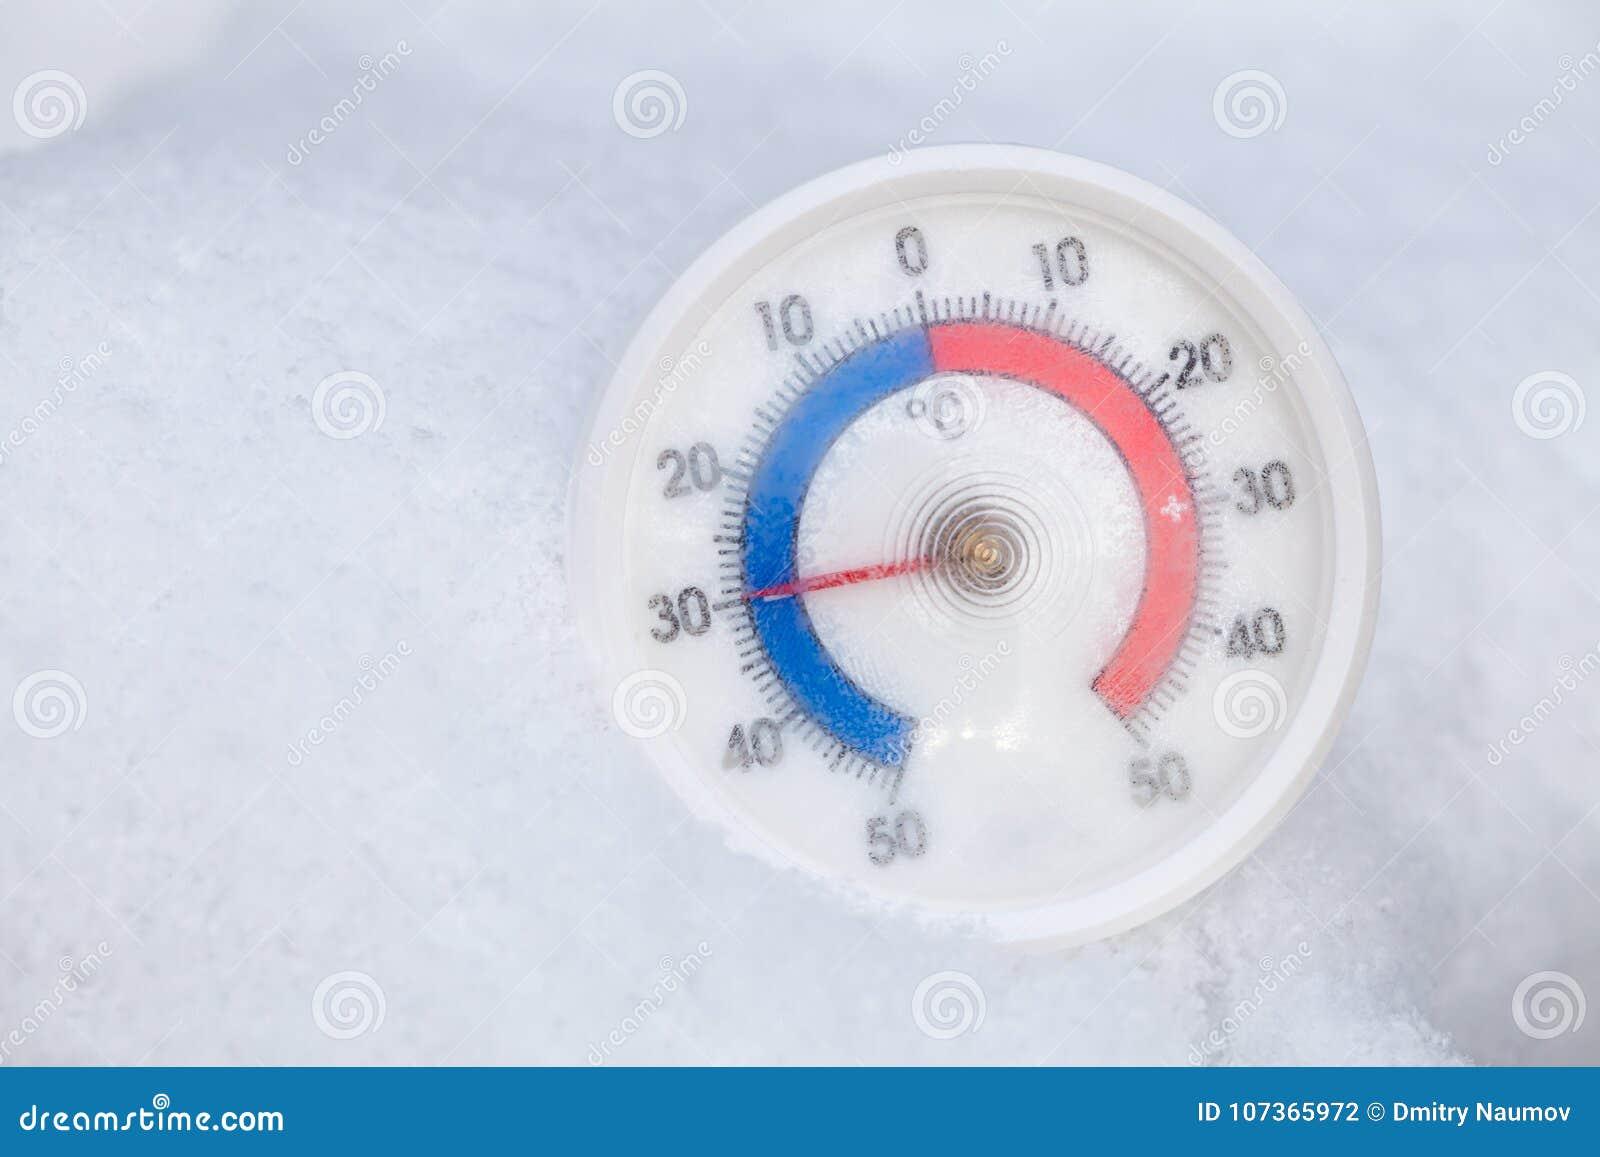 De bevroren thermometer toont minus 30 Celsius-graad extreme koude wi